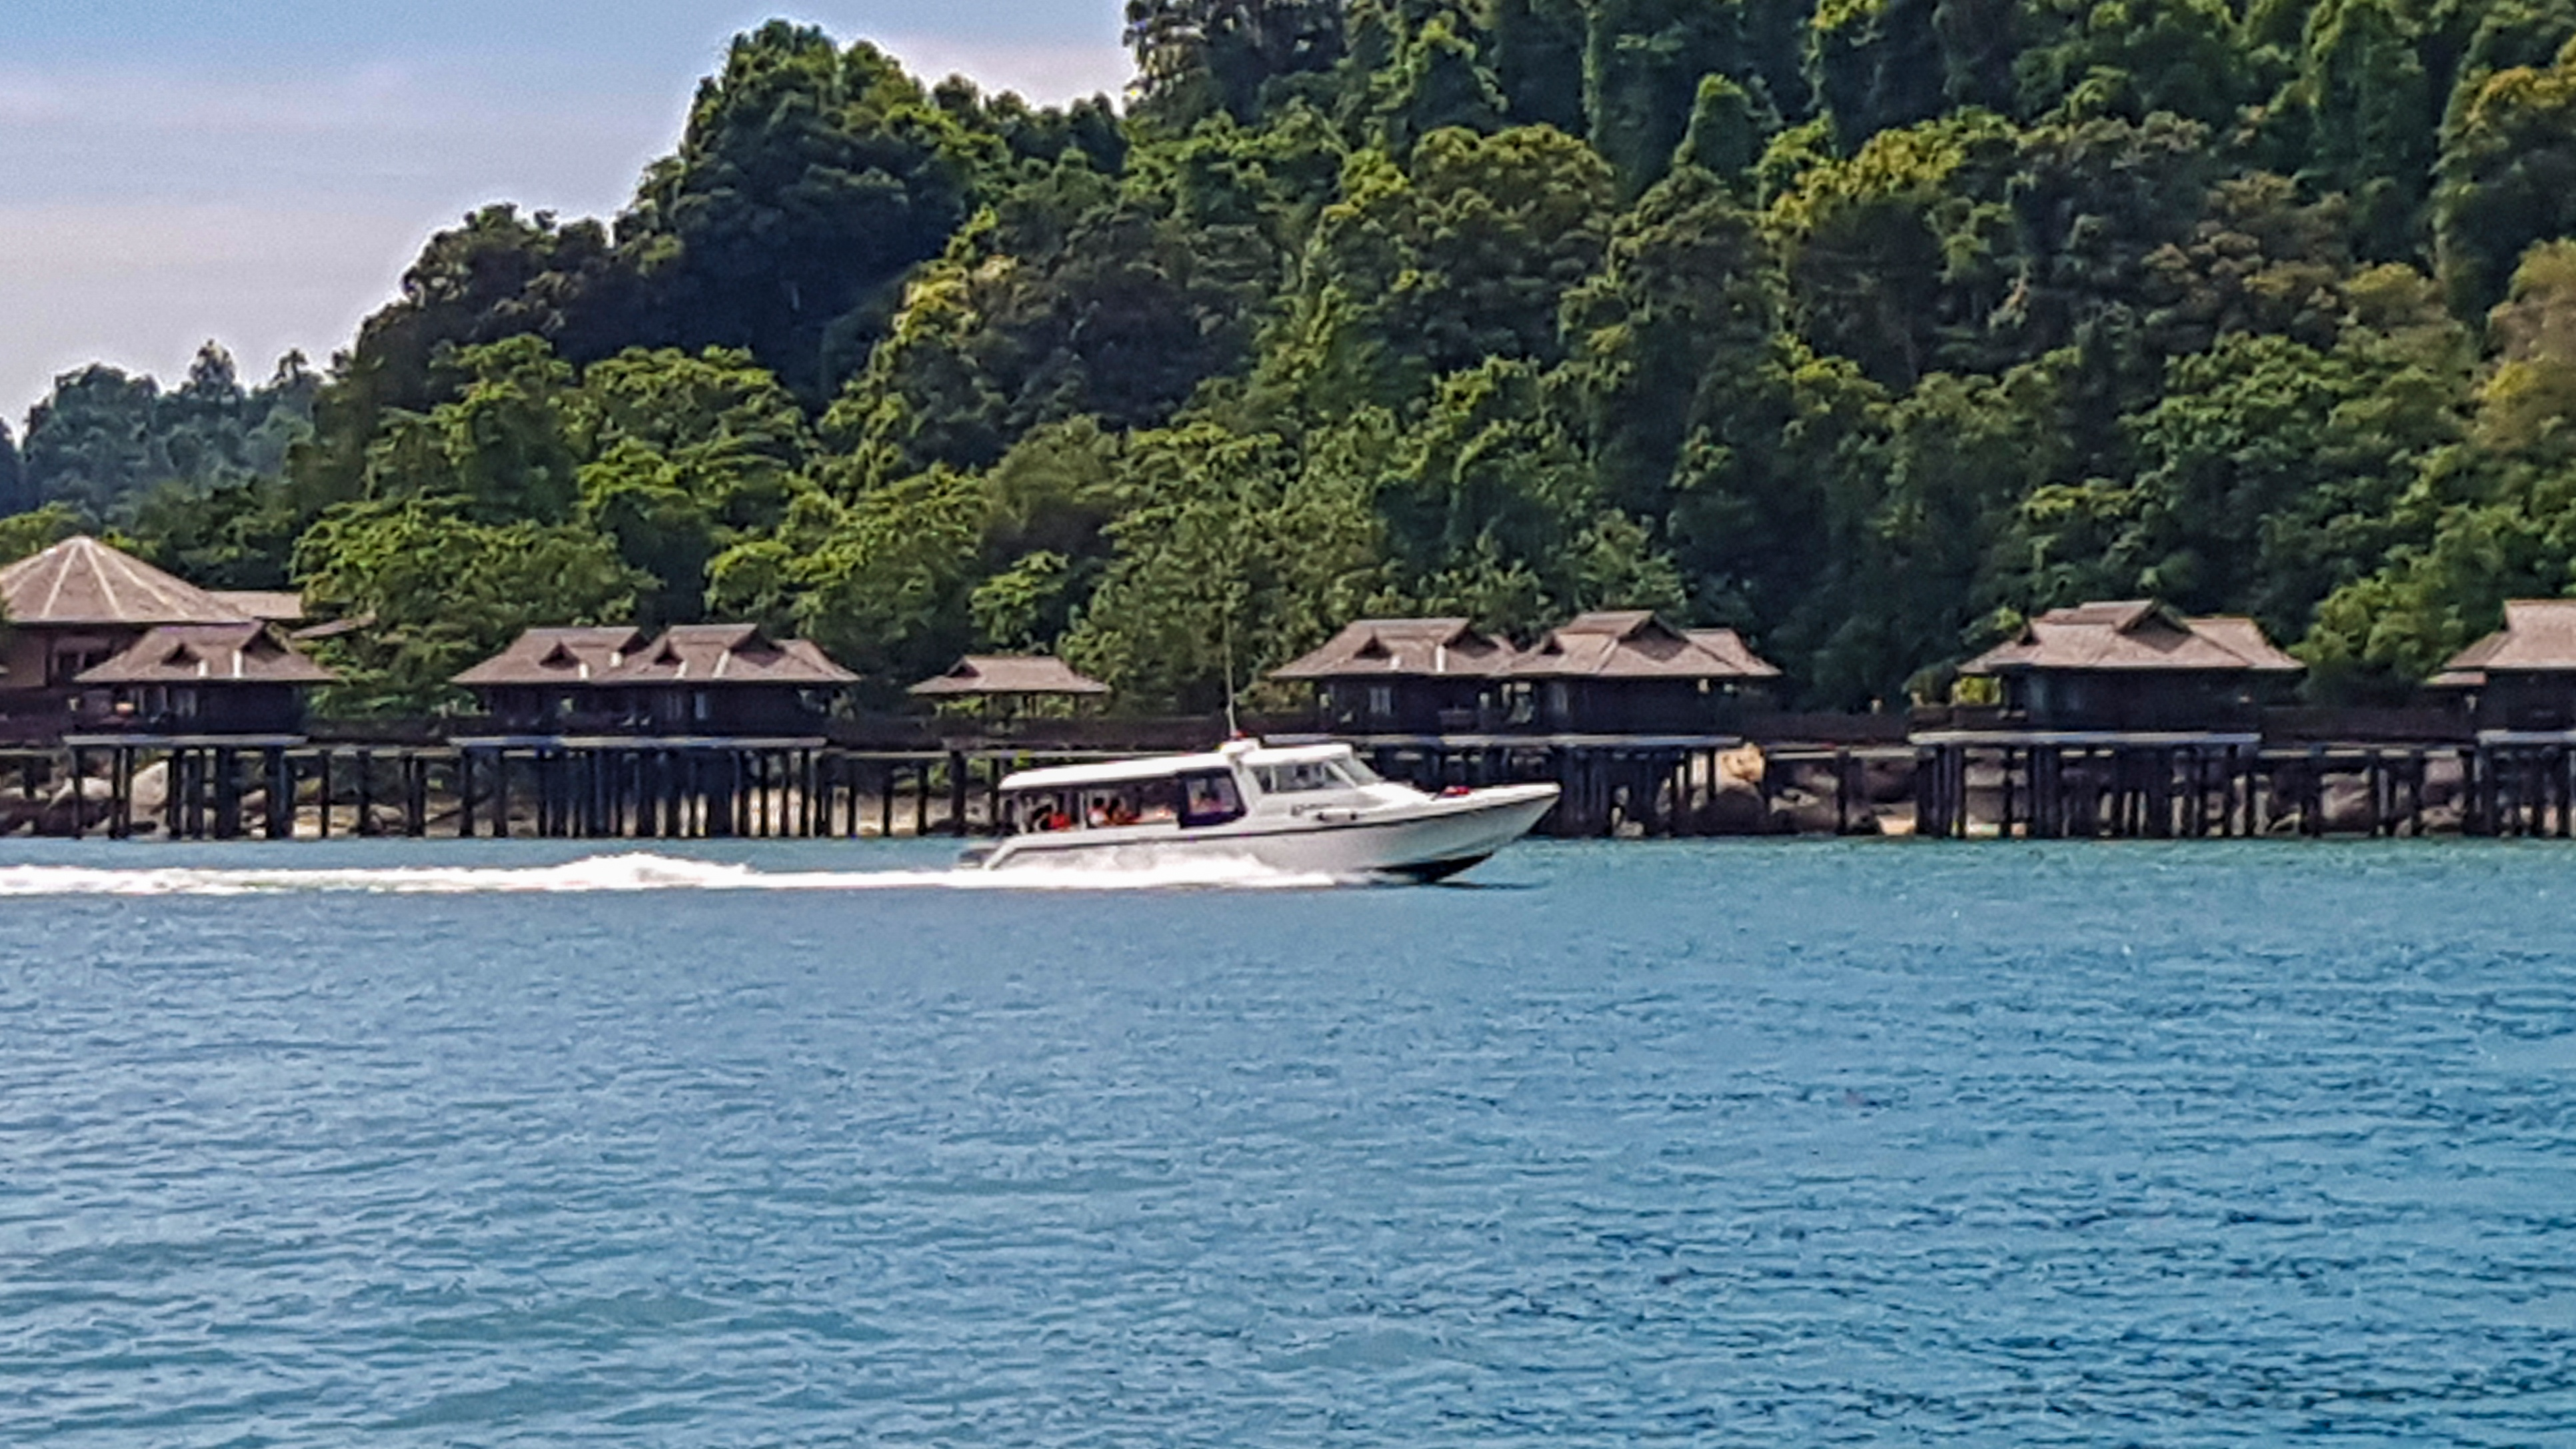 Gulf Craft in Malaysia (20).jpg